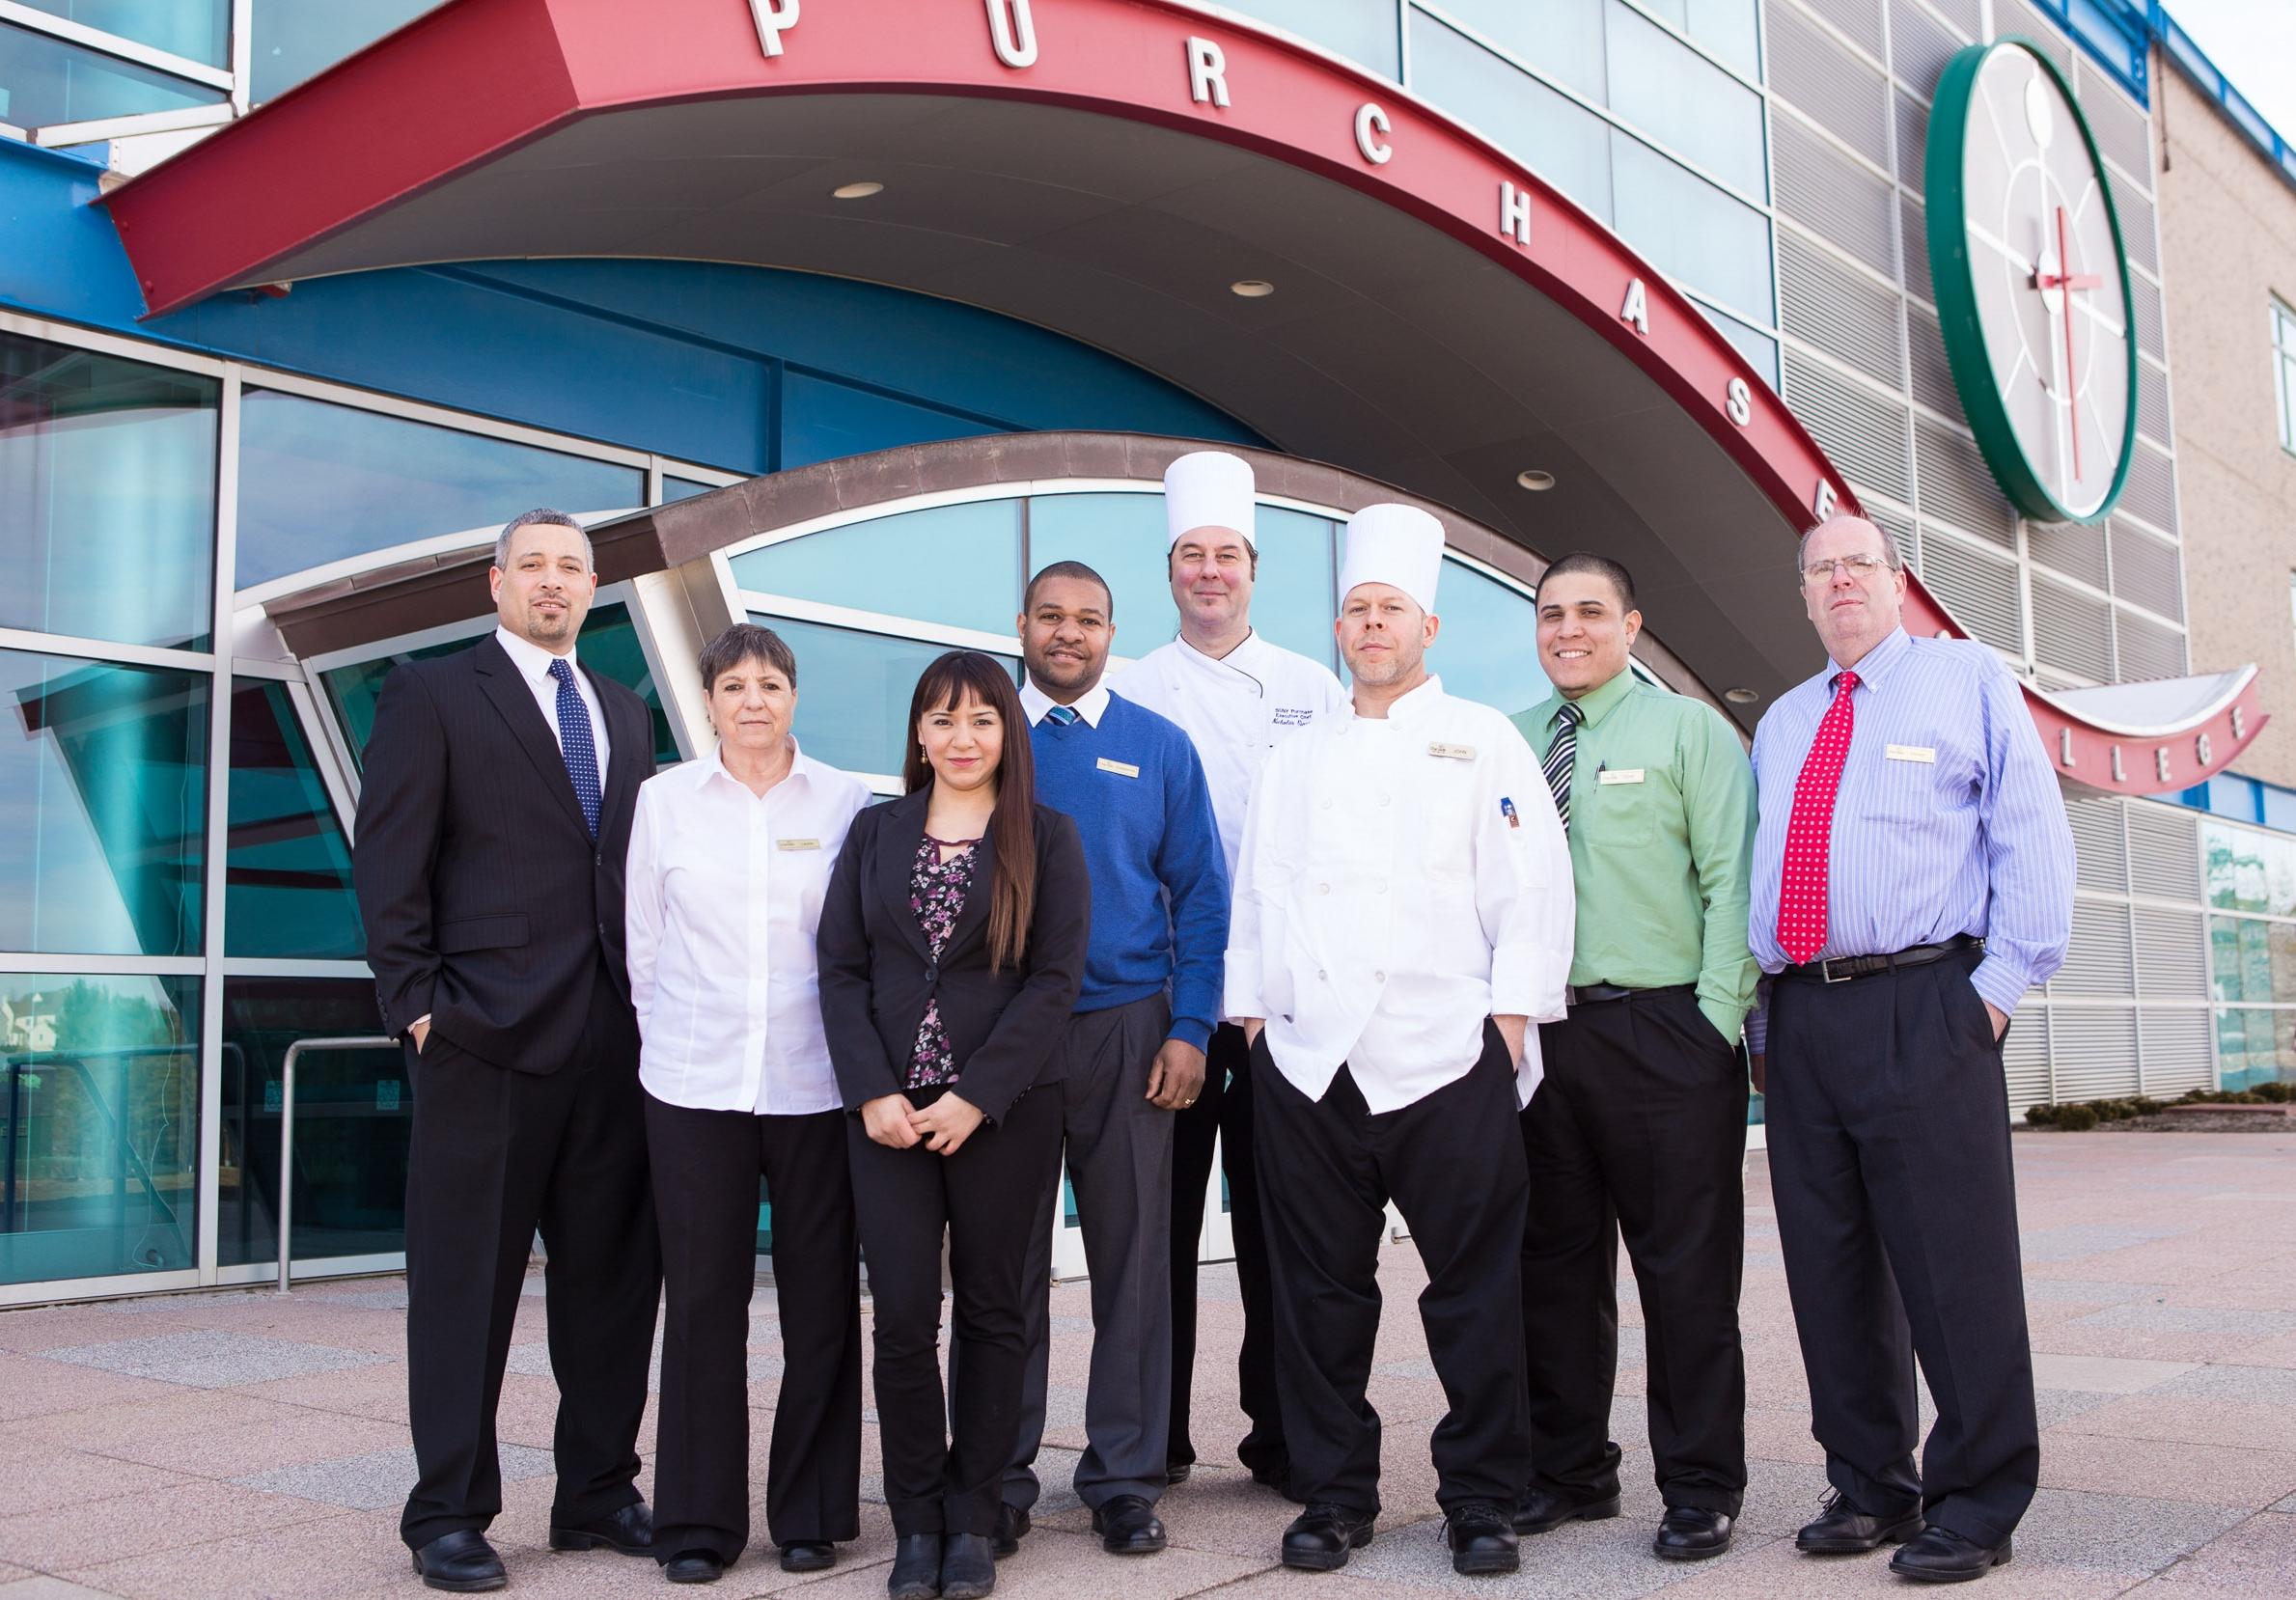 Culinary Team Corporate Photo